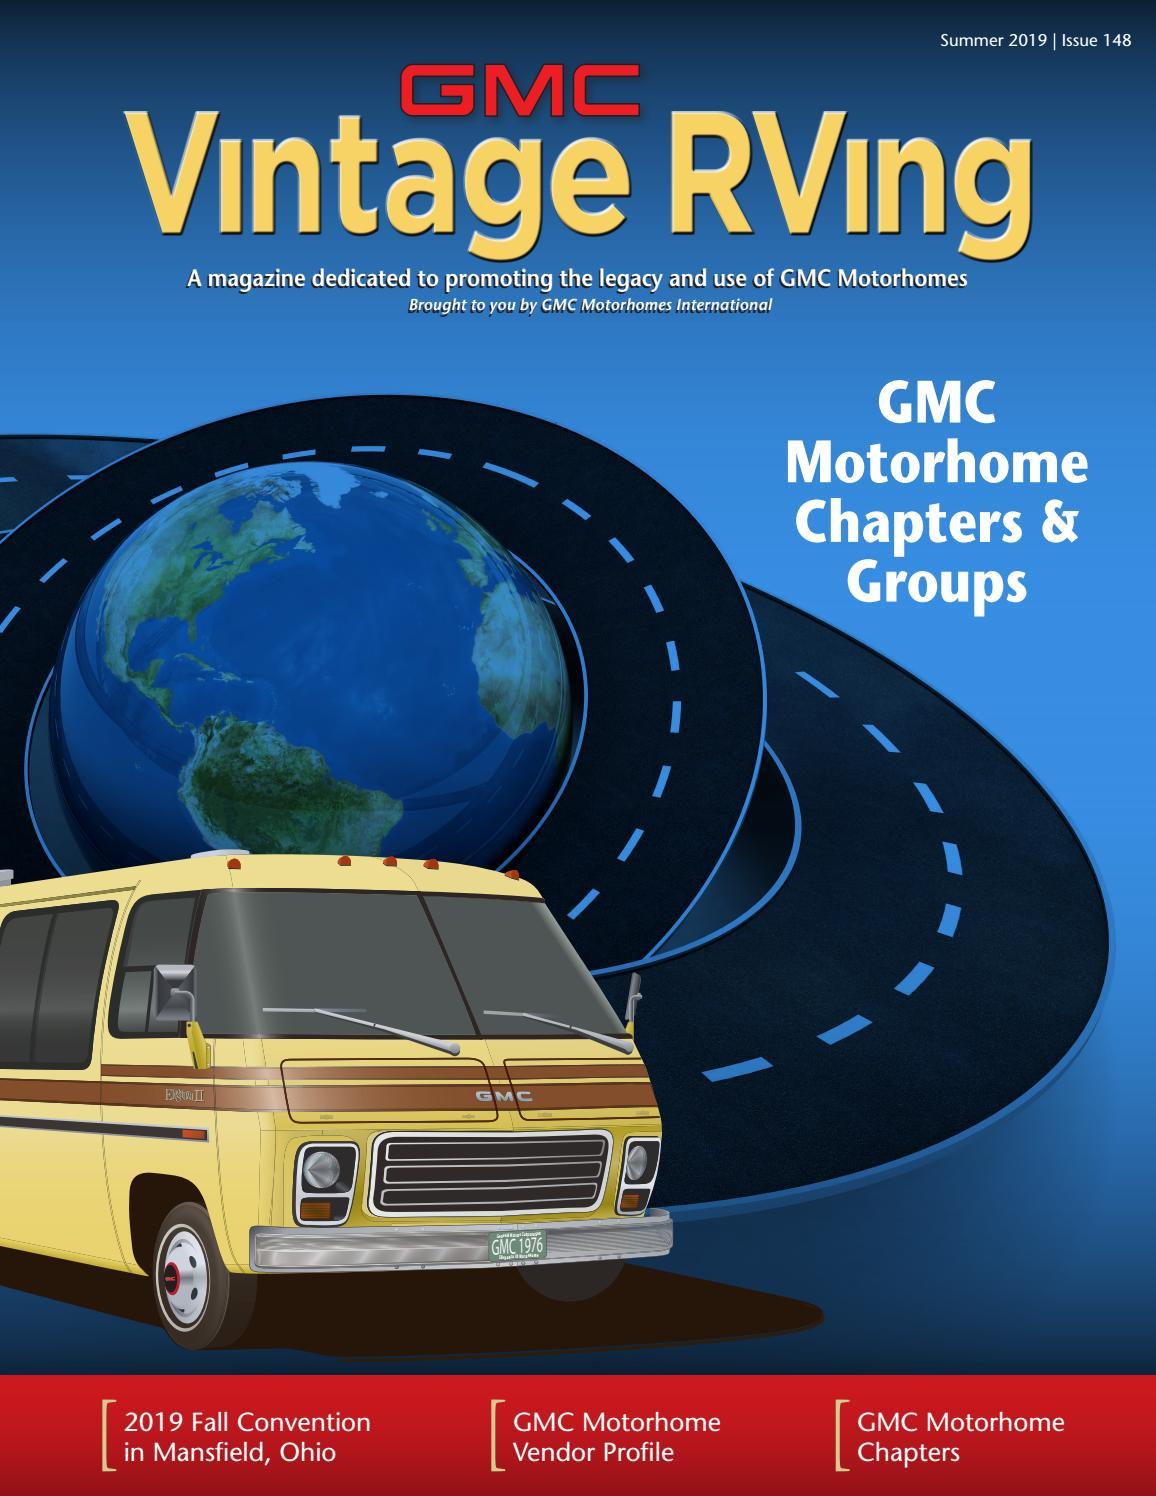 Gmc Vintage Rving Magazine Summer 2019 By Ceva Design Issuu